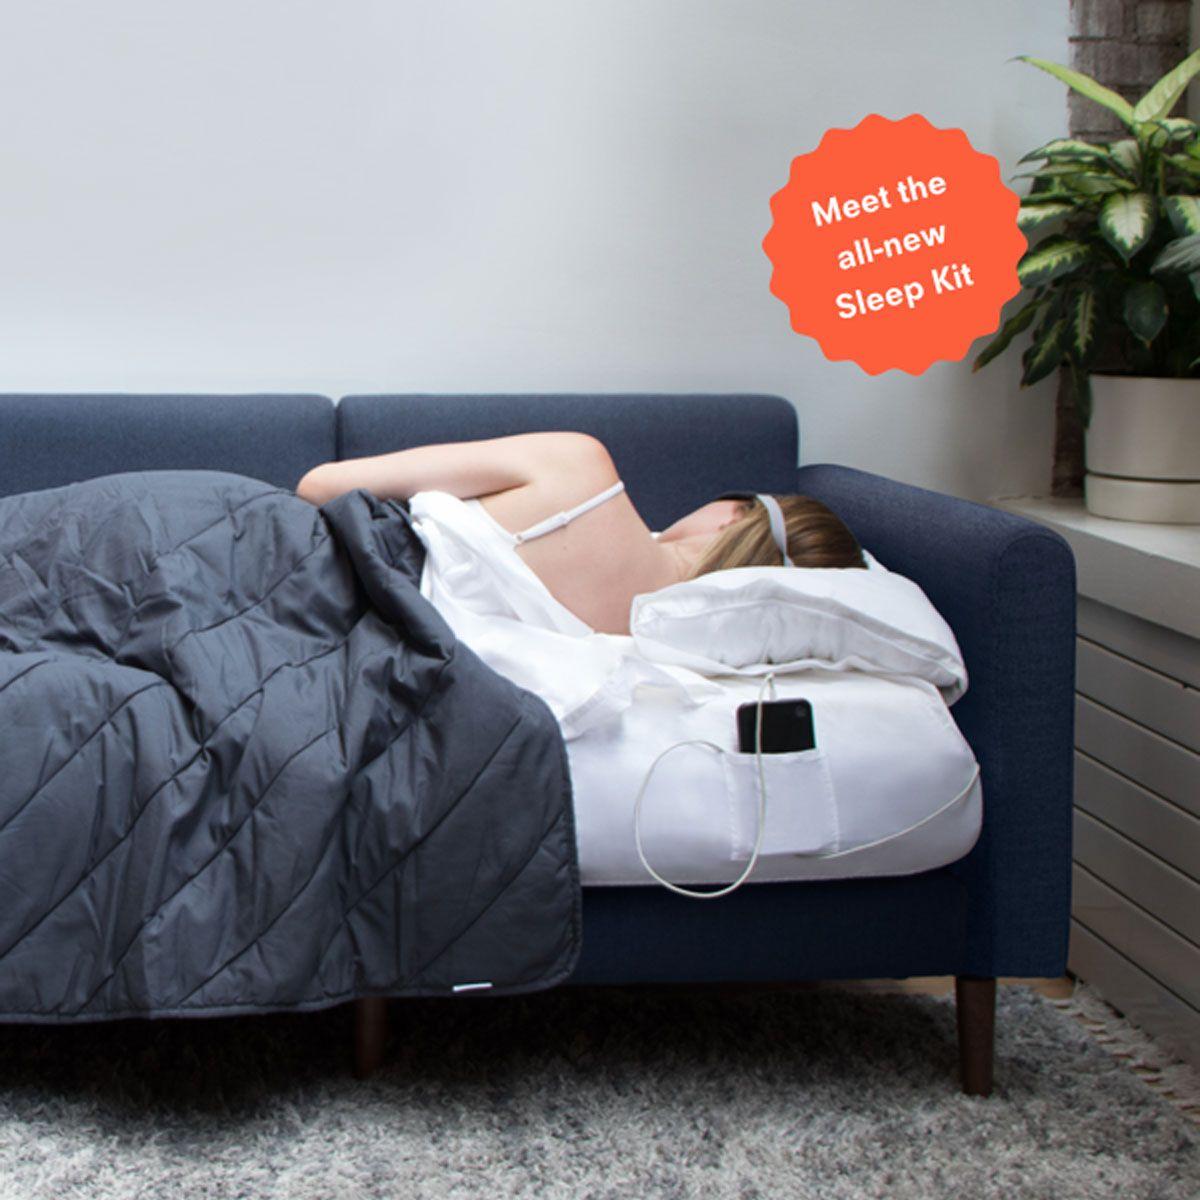 Burow S Sleep Kit Will Turn Your Sofa Into The Perfect